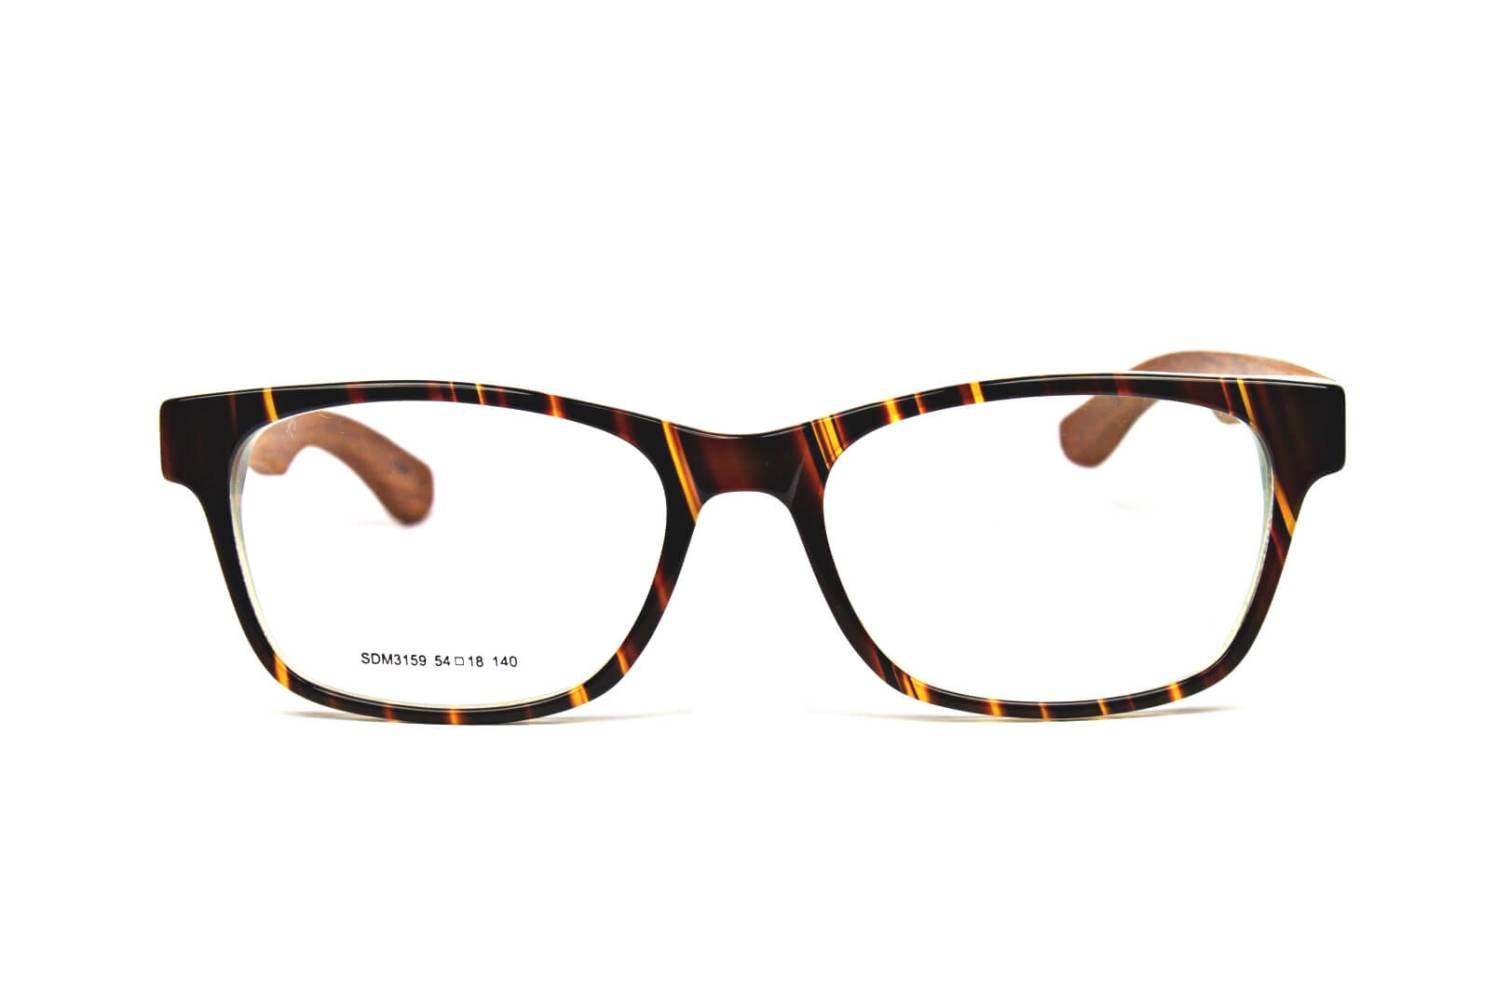 Wooden Eyeglasses